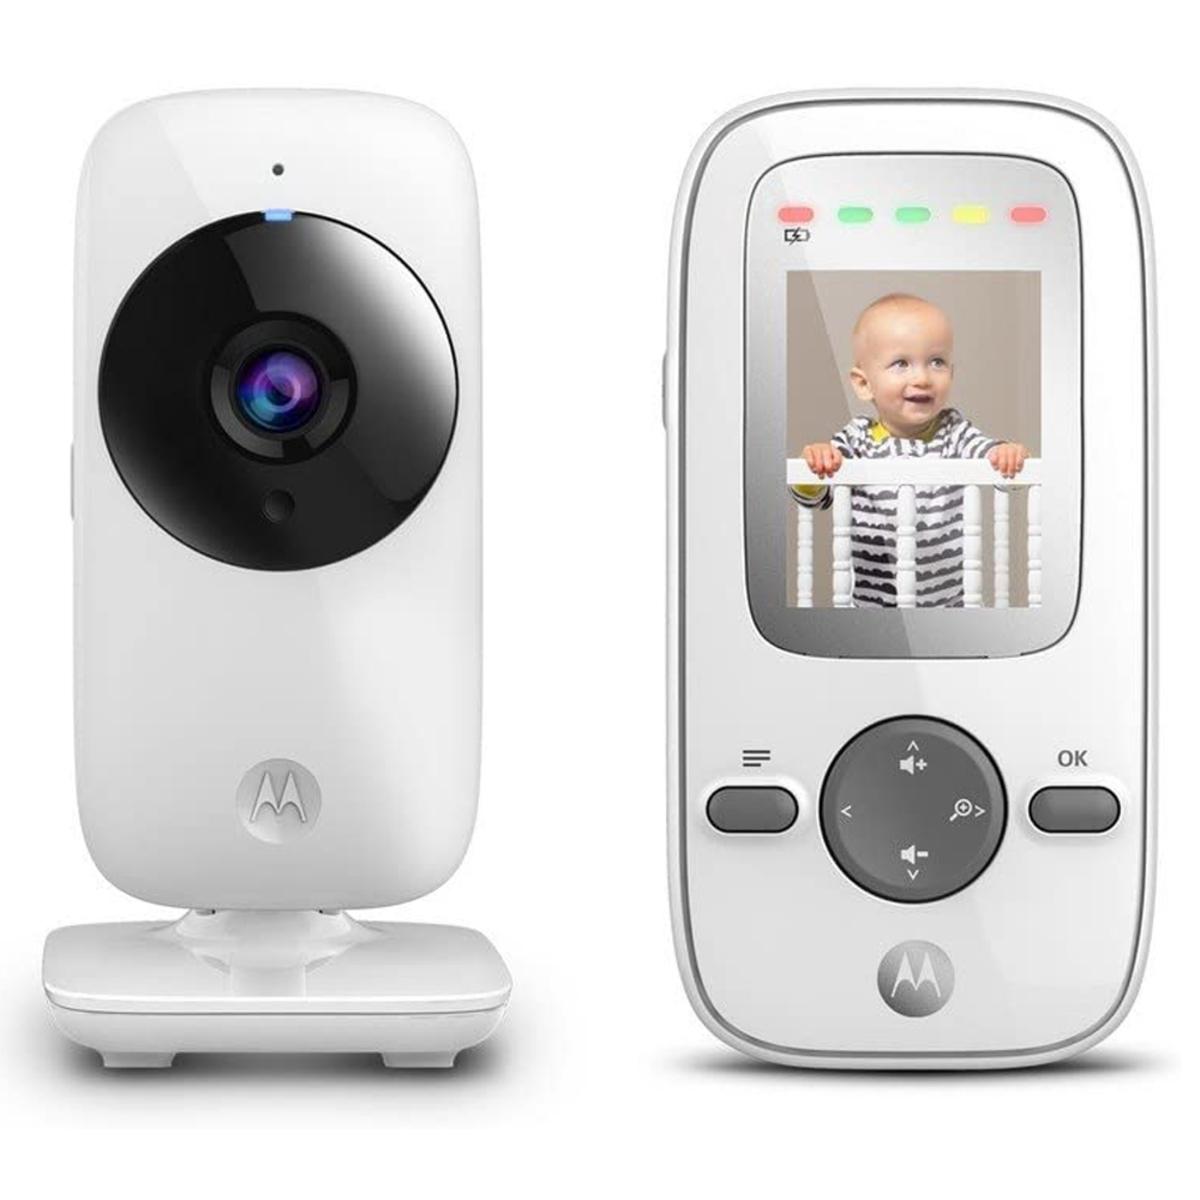 Écoute bébé Babyphone MBP481 Babyphone MBP481